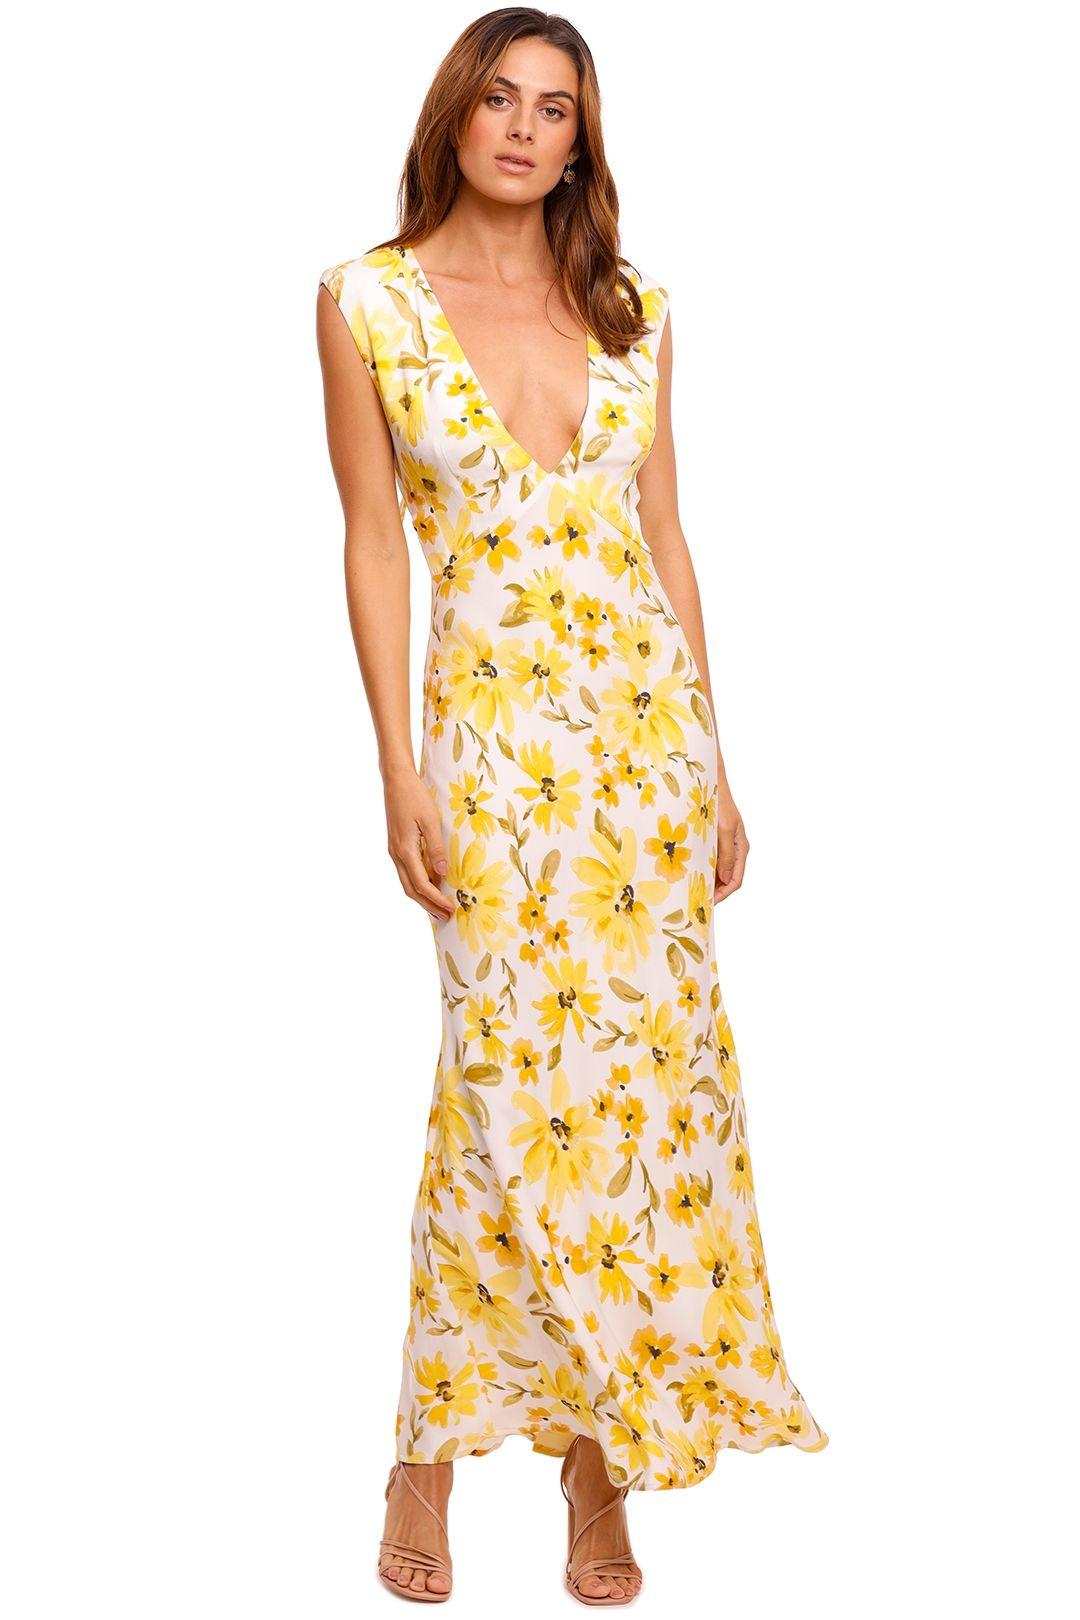 Bec and Bridge Daphne Midi Dress print